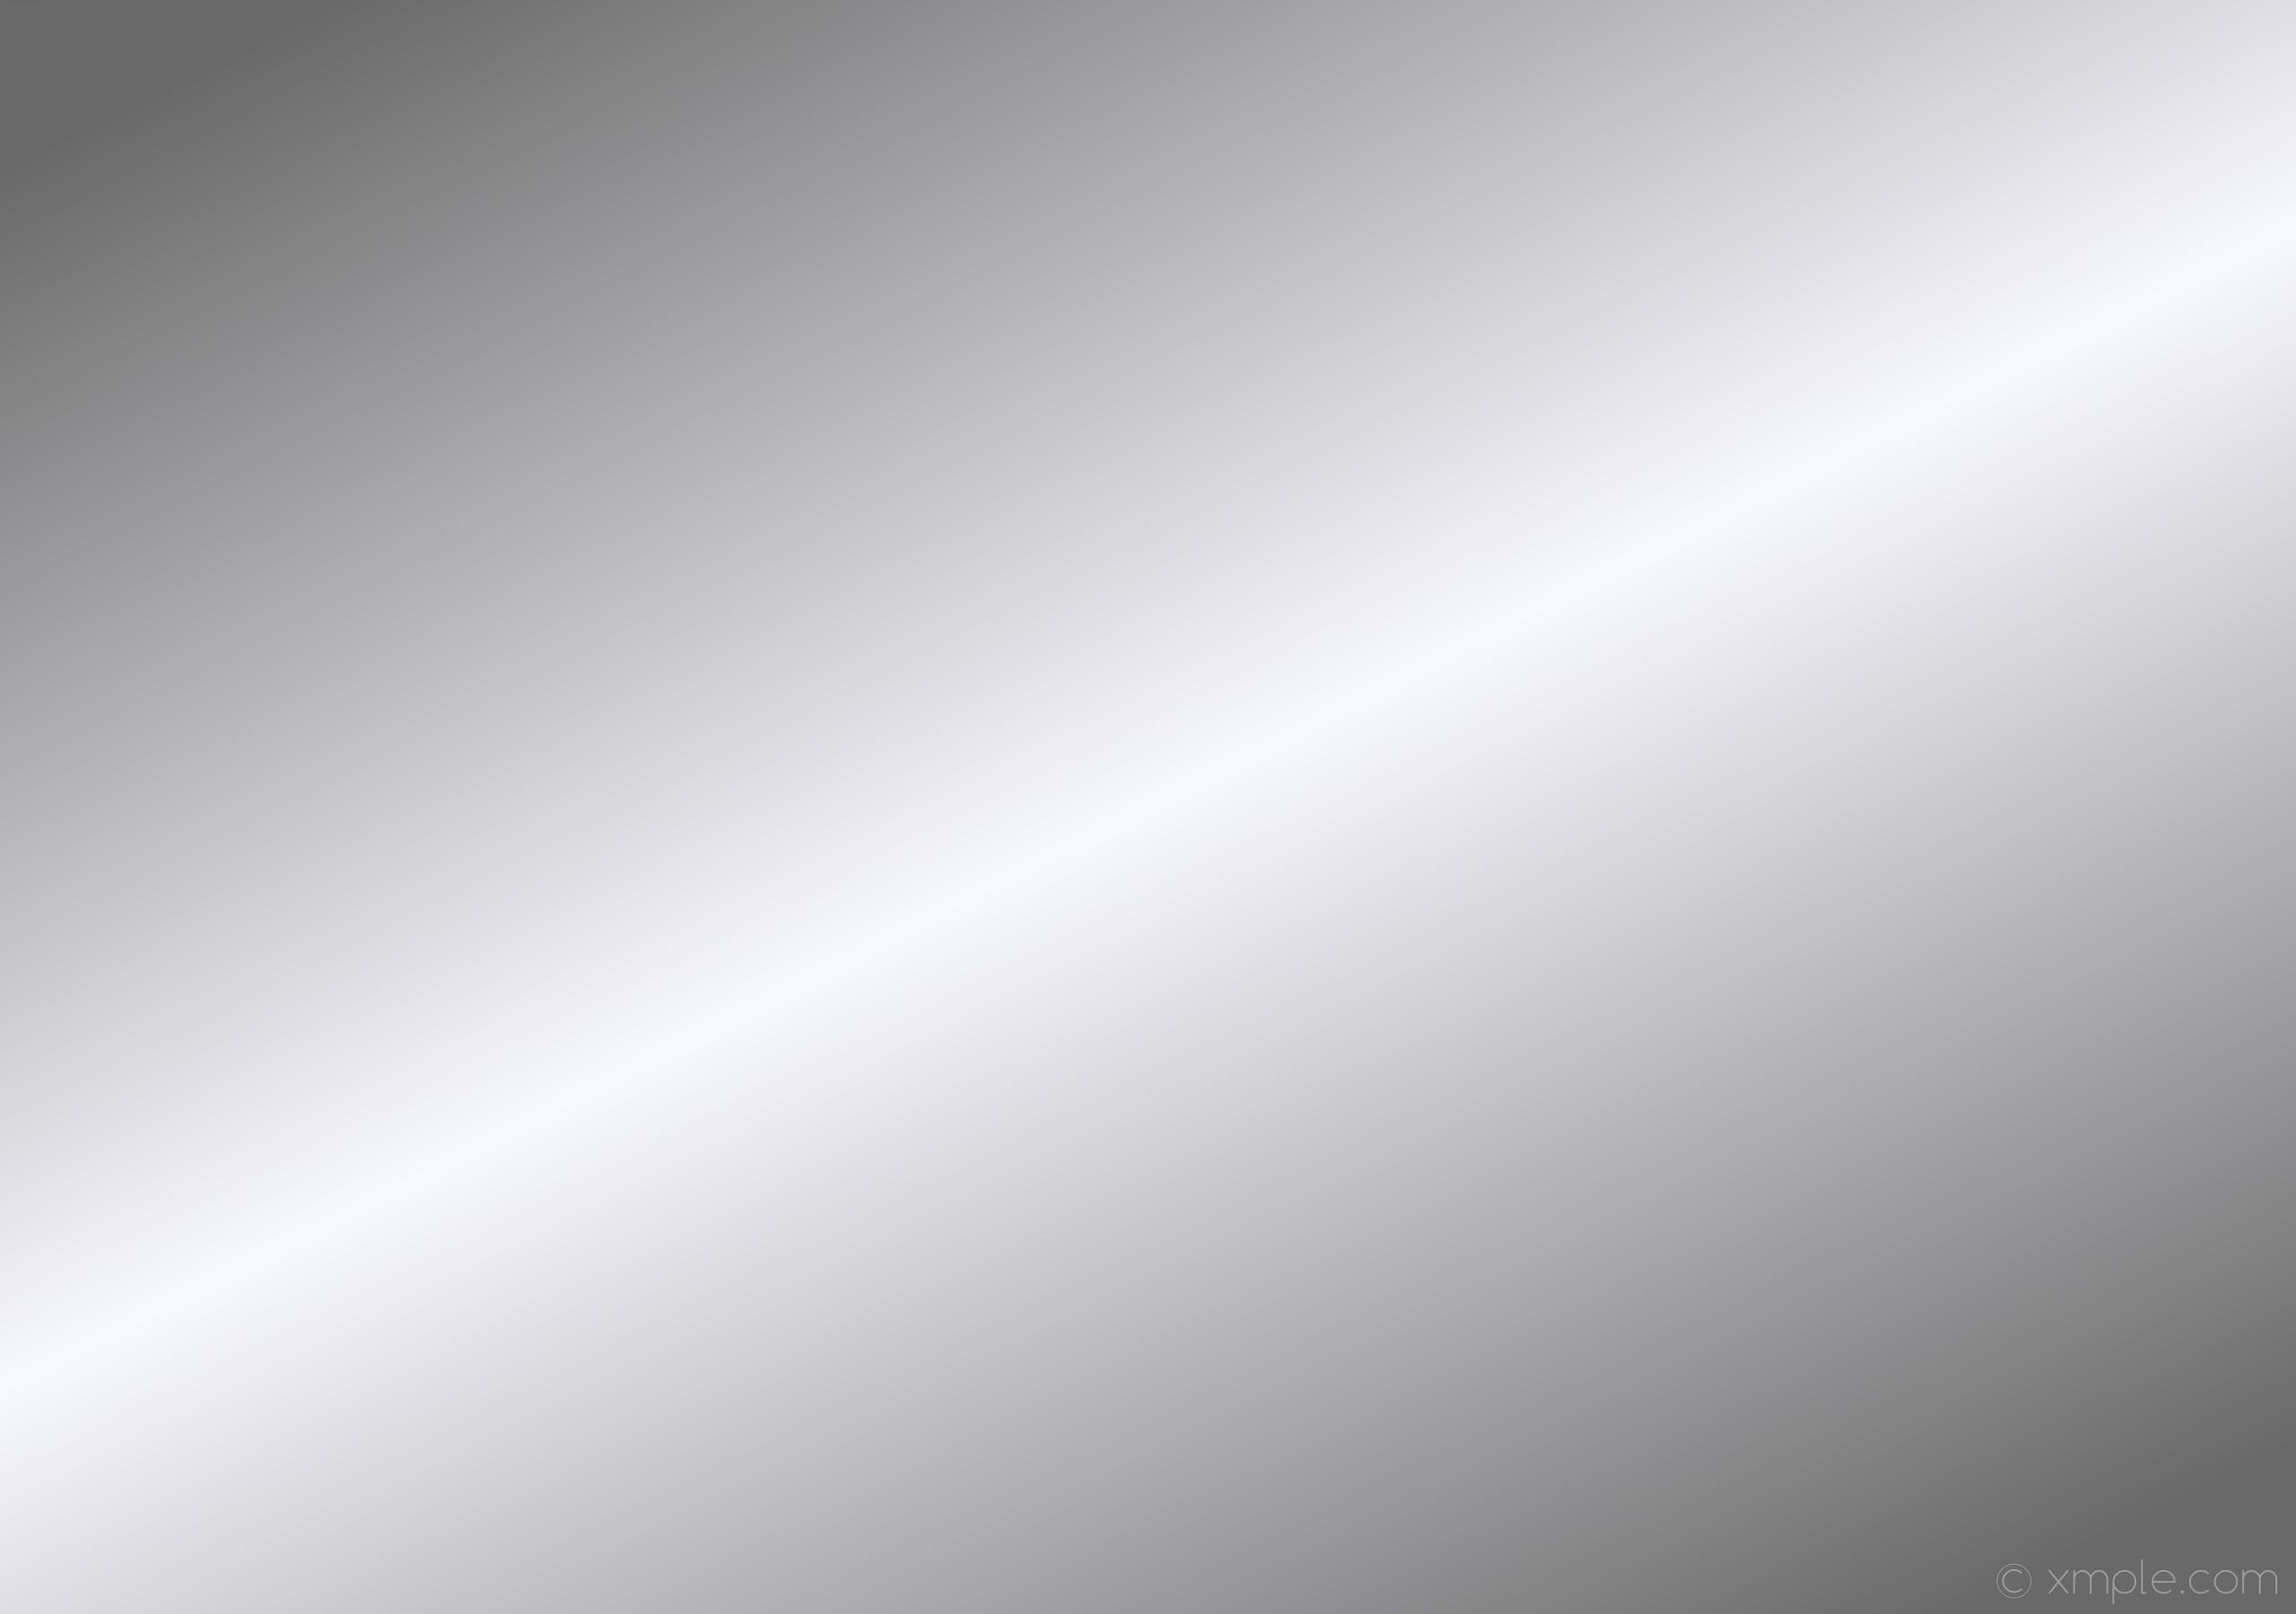 wallpaper grey white gradient highlight linear dim gray ghost white #696969  #f8f8ff 135°